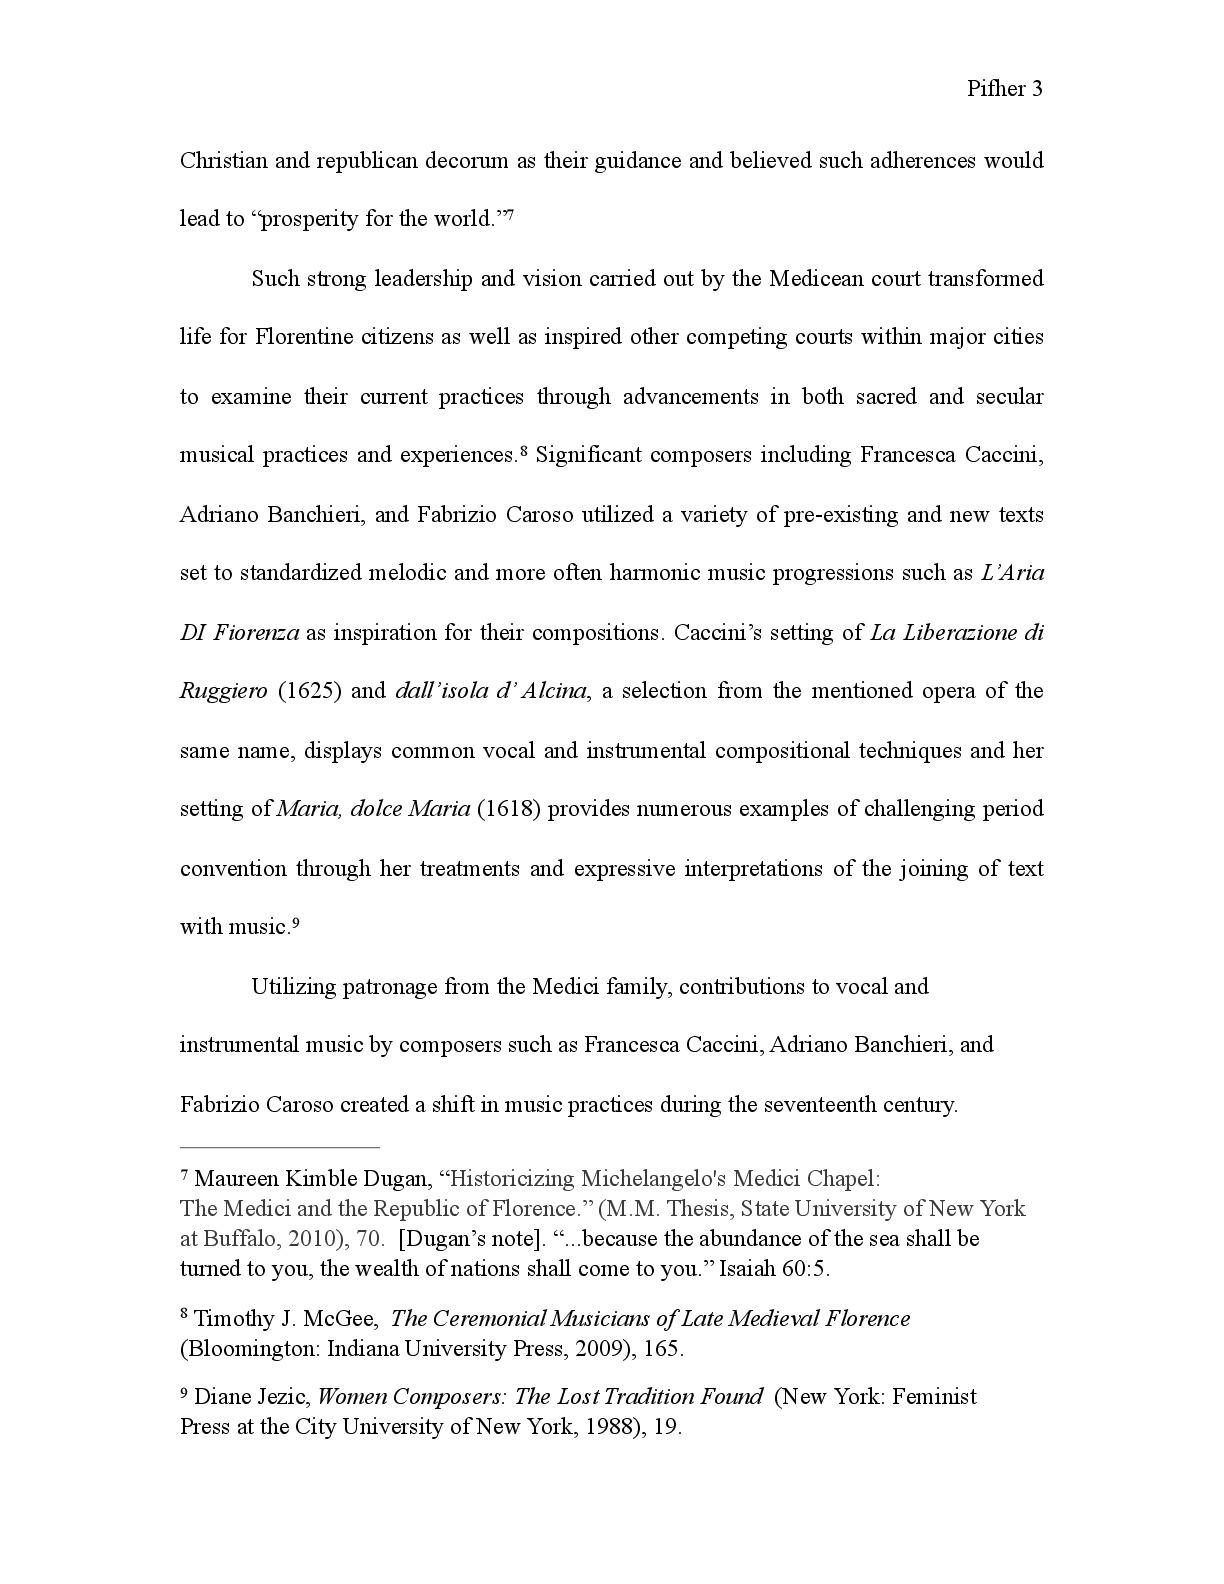 Jeff-Pifher-Music-and-Mediciean-Influences-(Academic-Series)-003.jpg